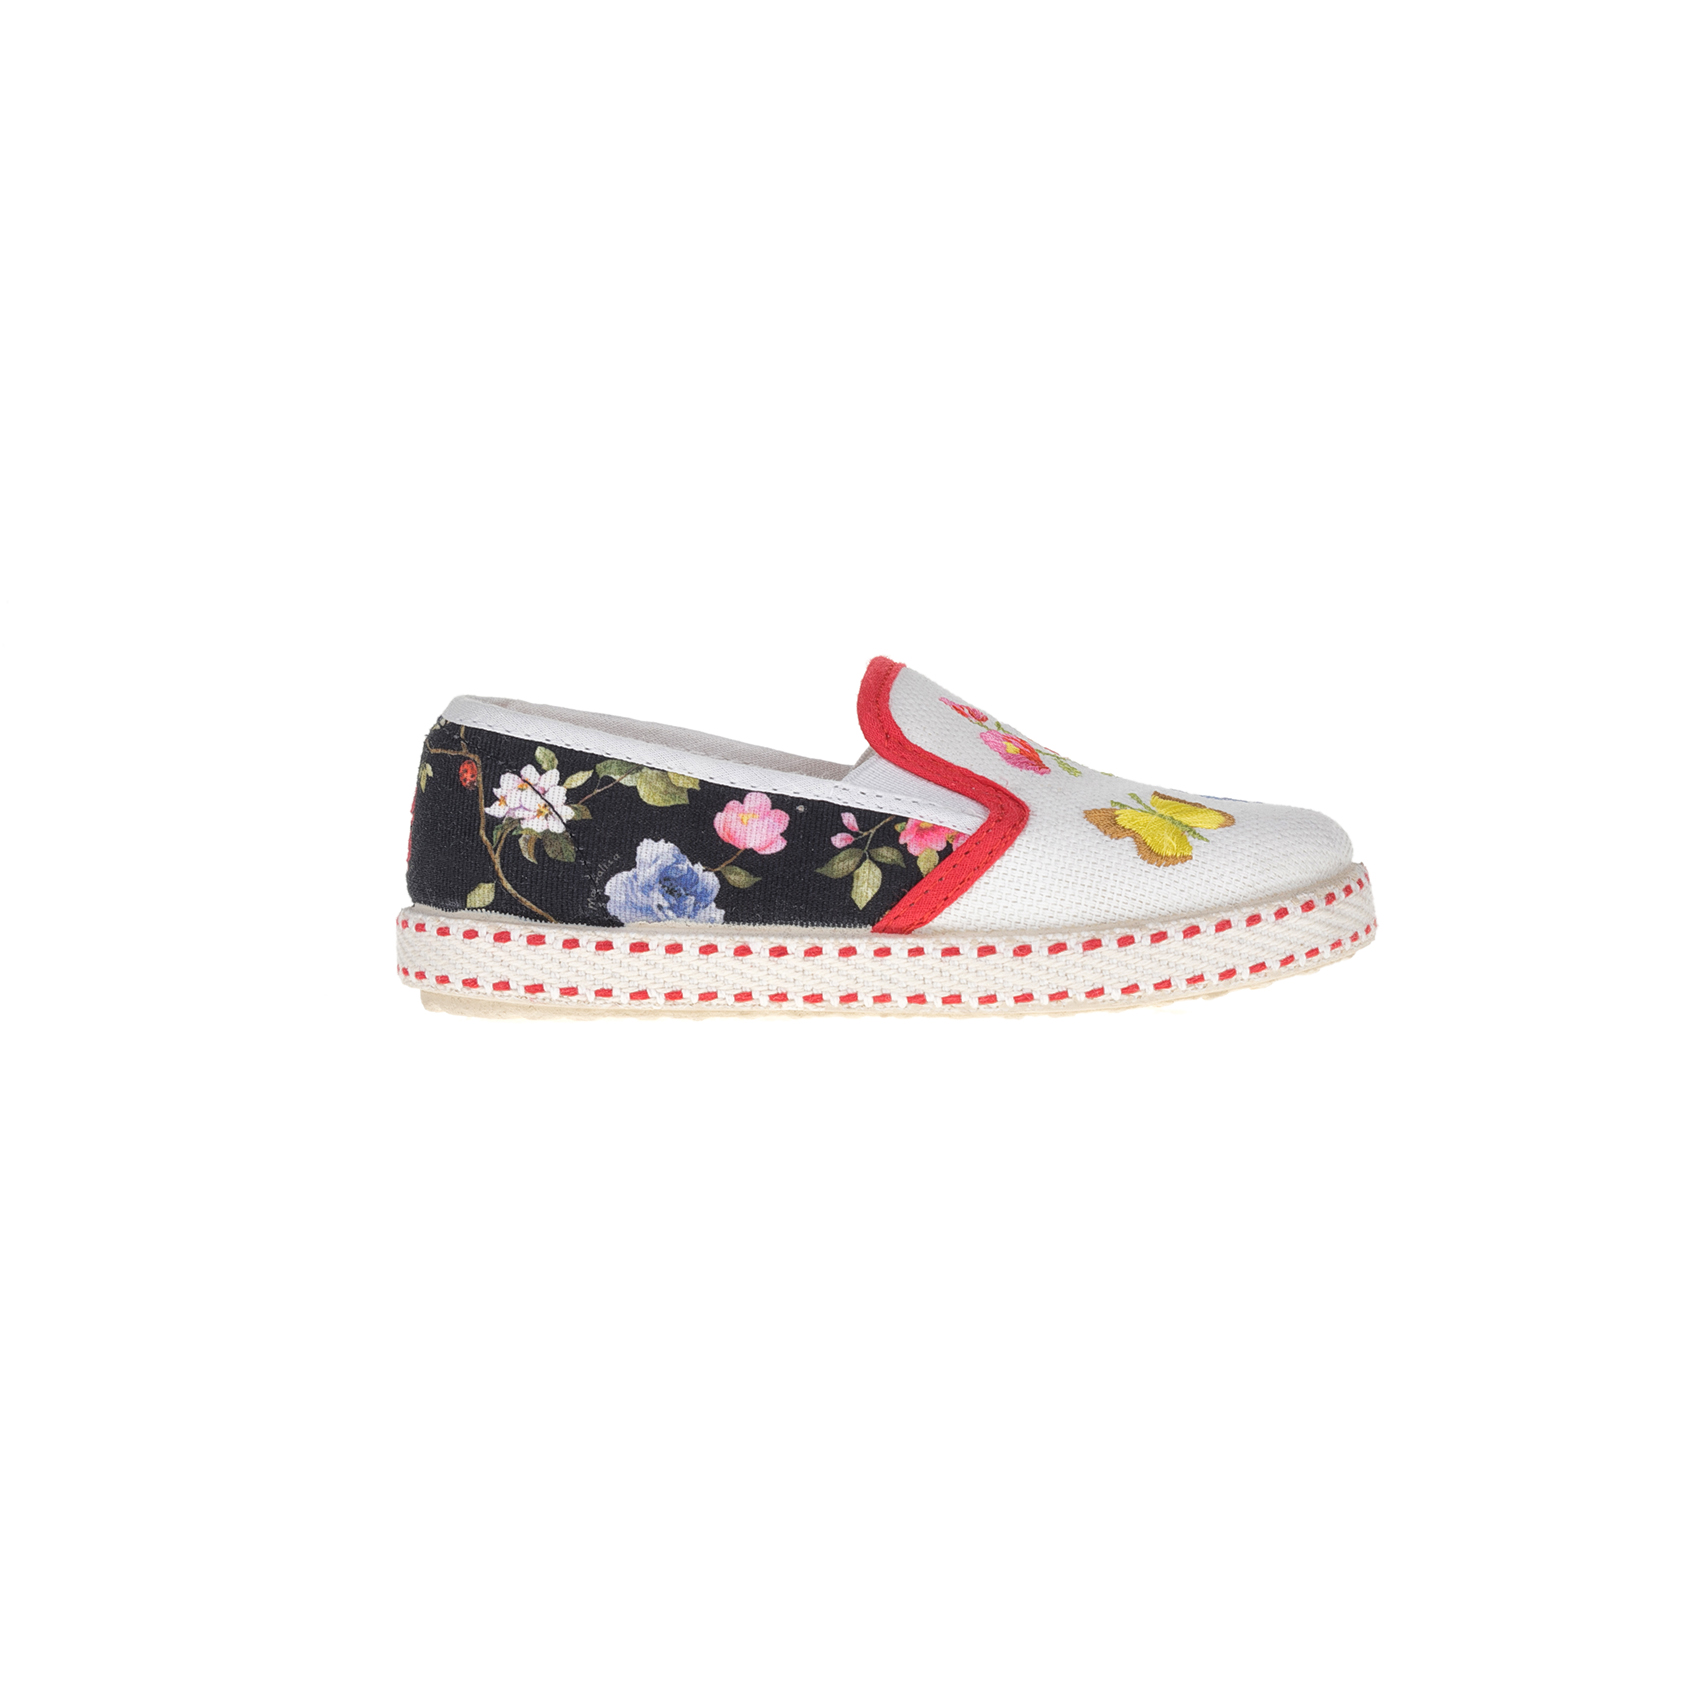 MONNALISA SHOES - Slip-on παπούτσια MONNALISA SHOES BOTANICO φλοράλ παιδικά girls παπούτσια εσπαντρίγιες slip on